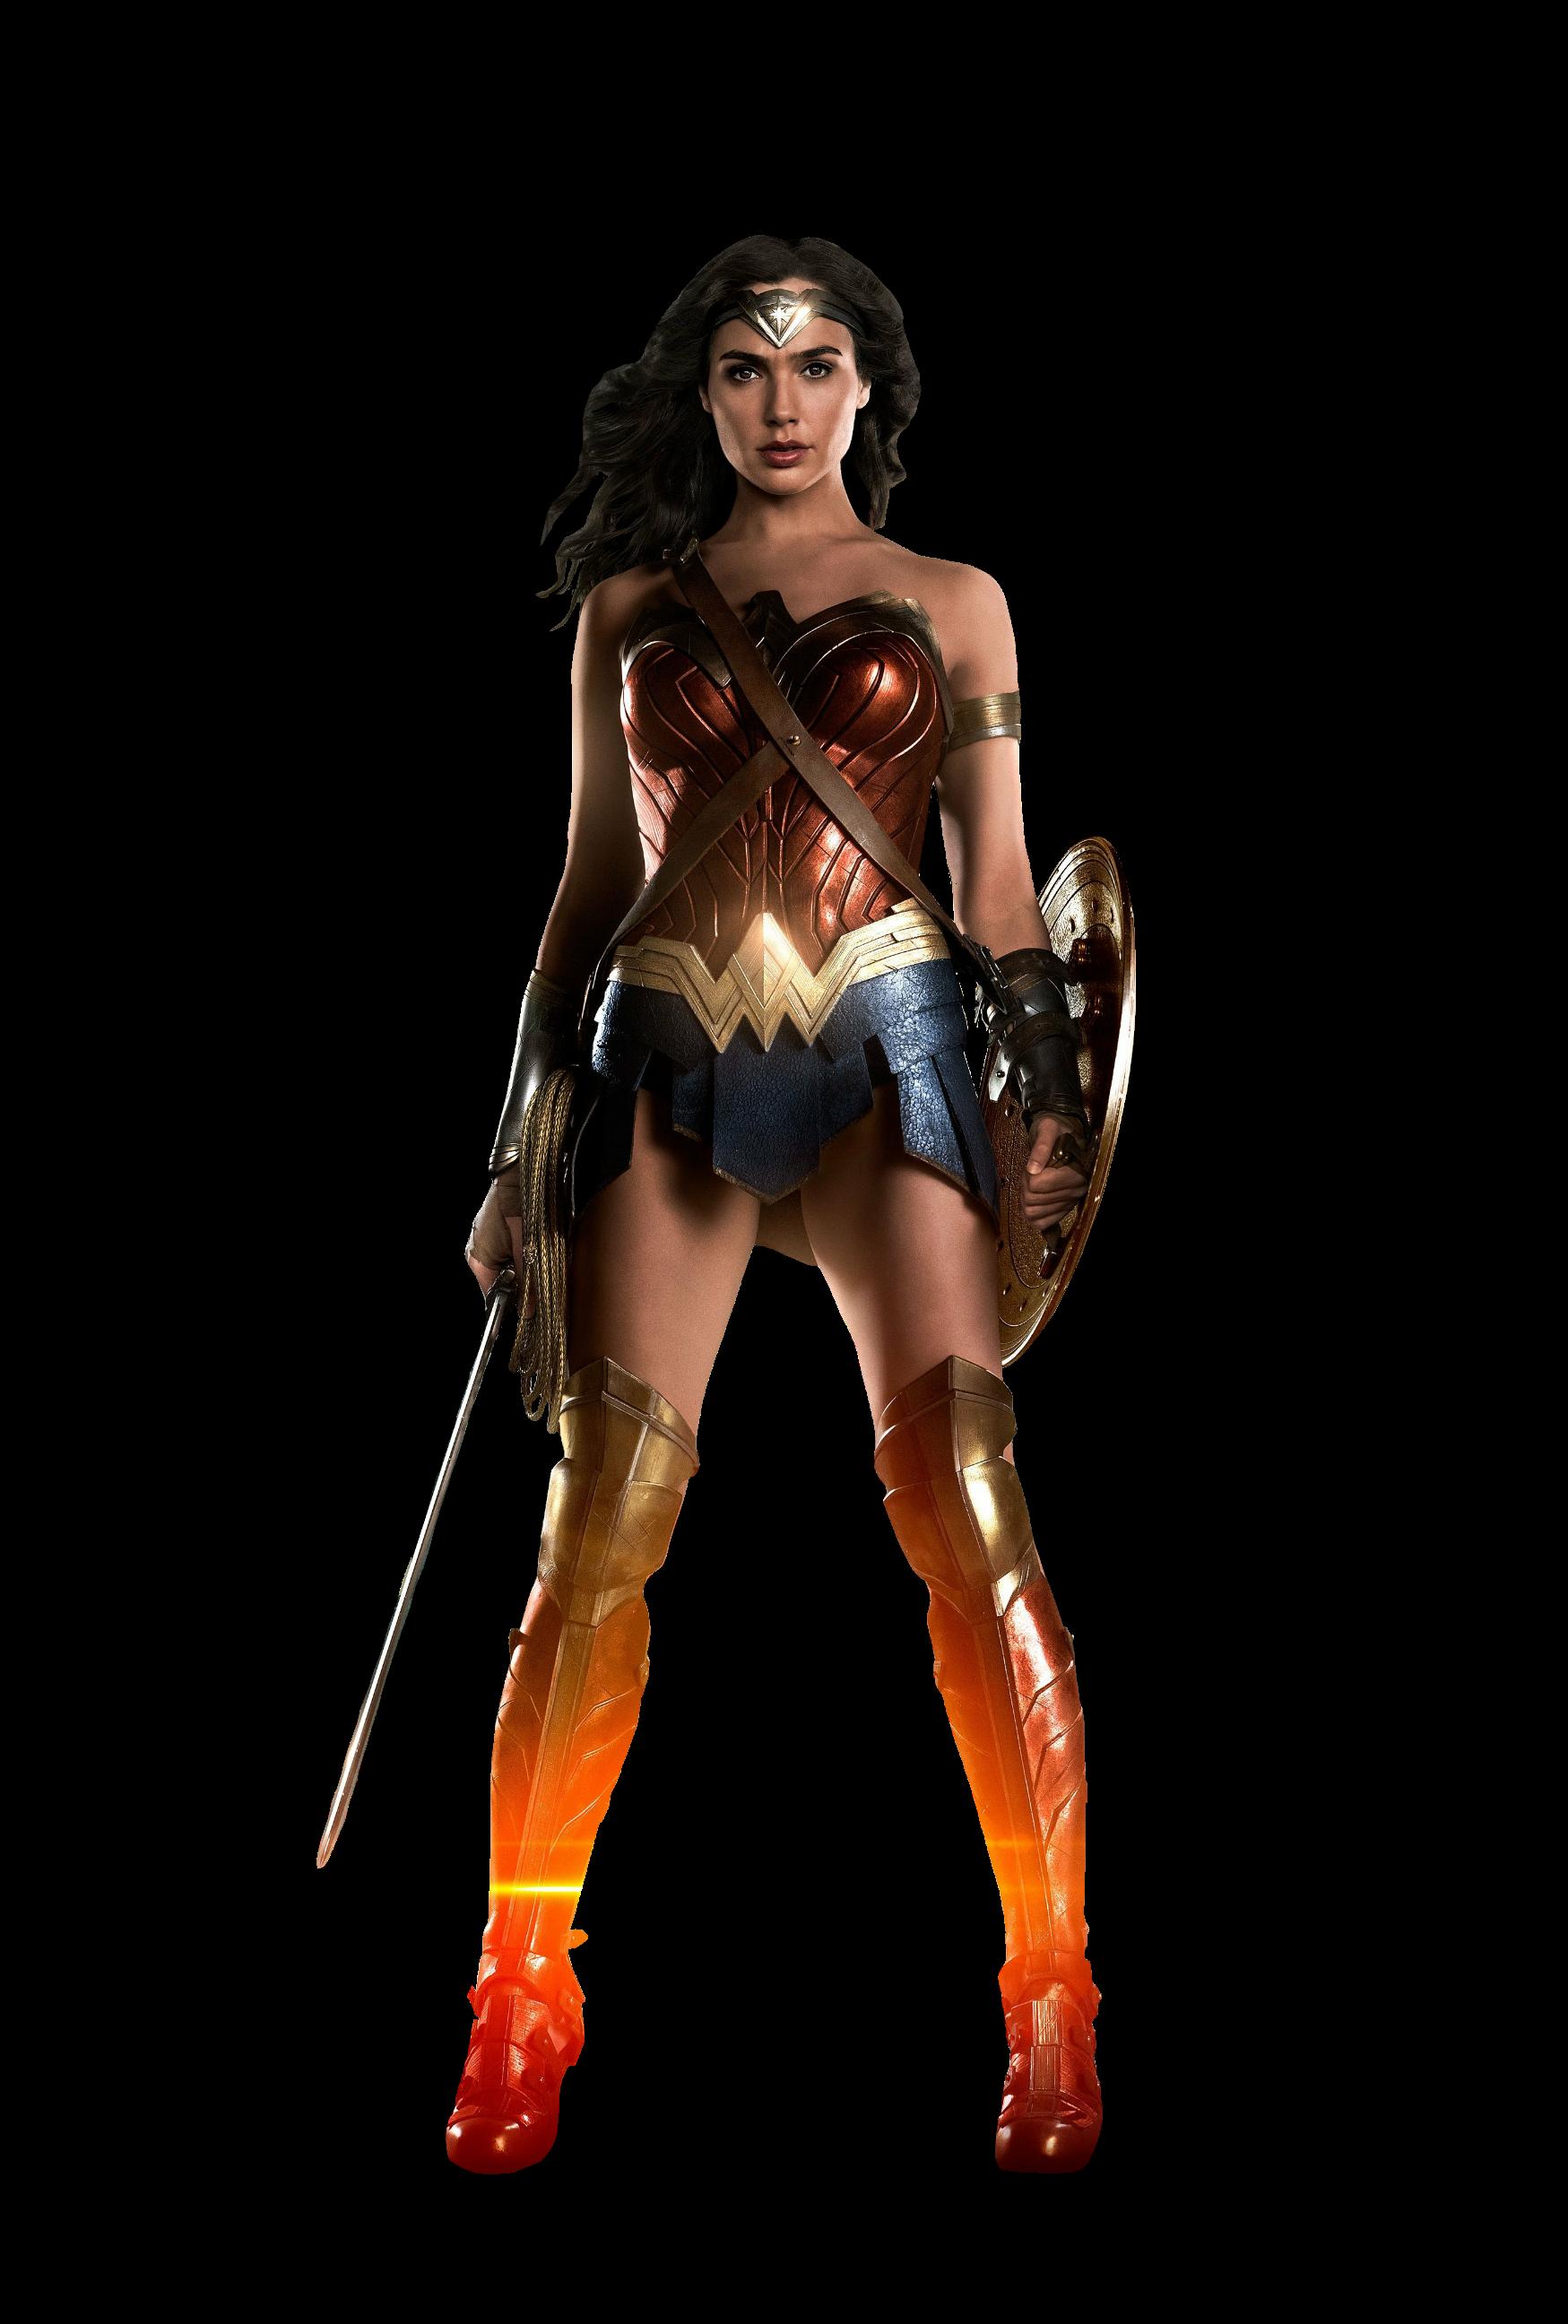 Warrior clipart transparent. Wonder woman transparentpng